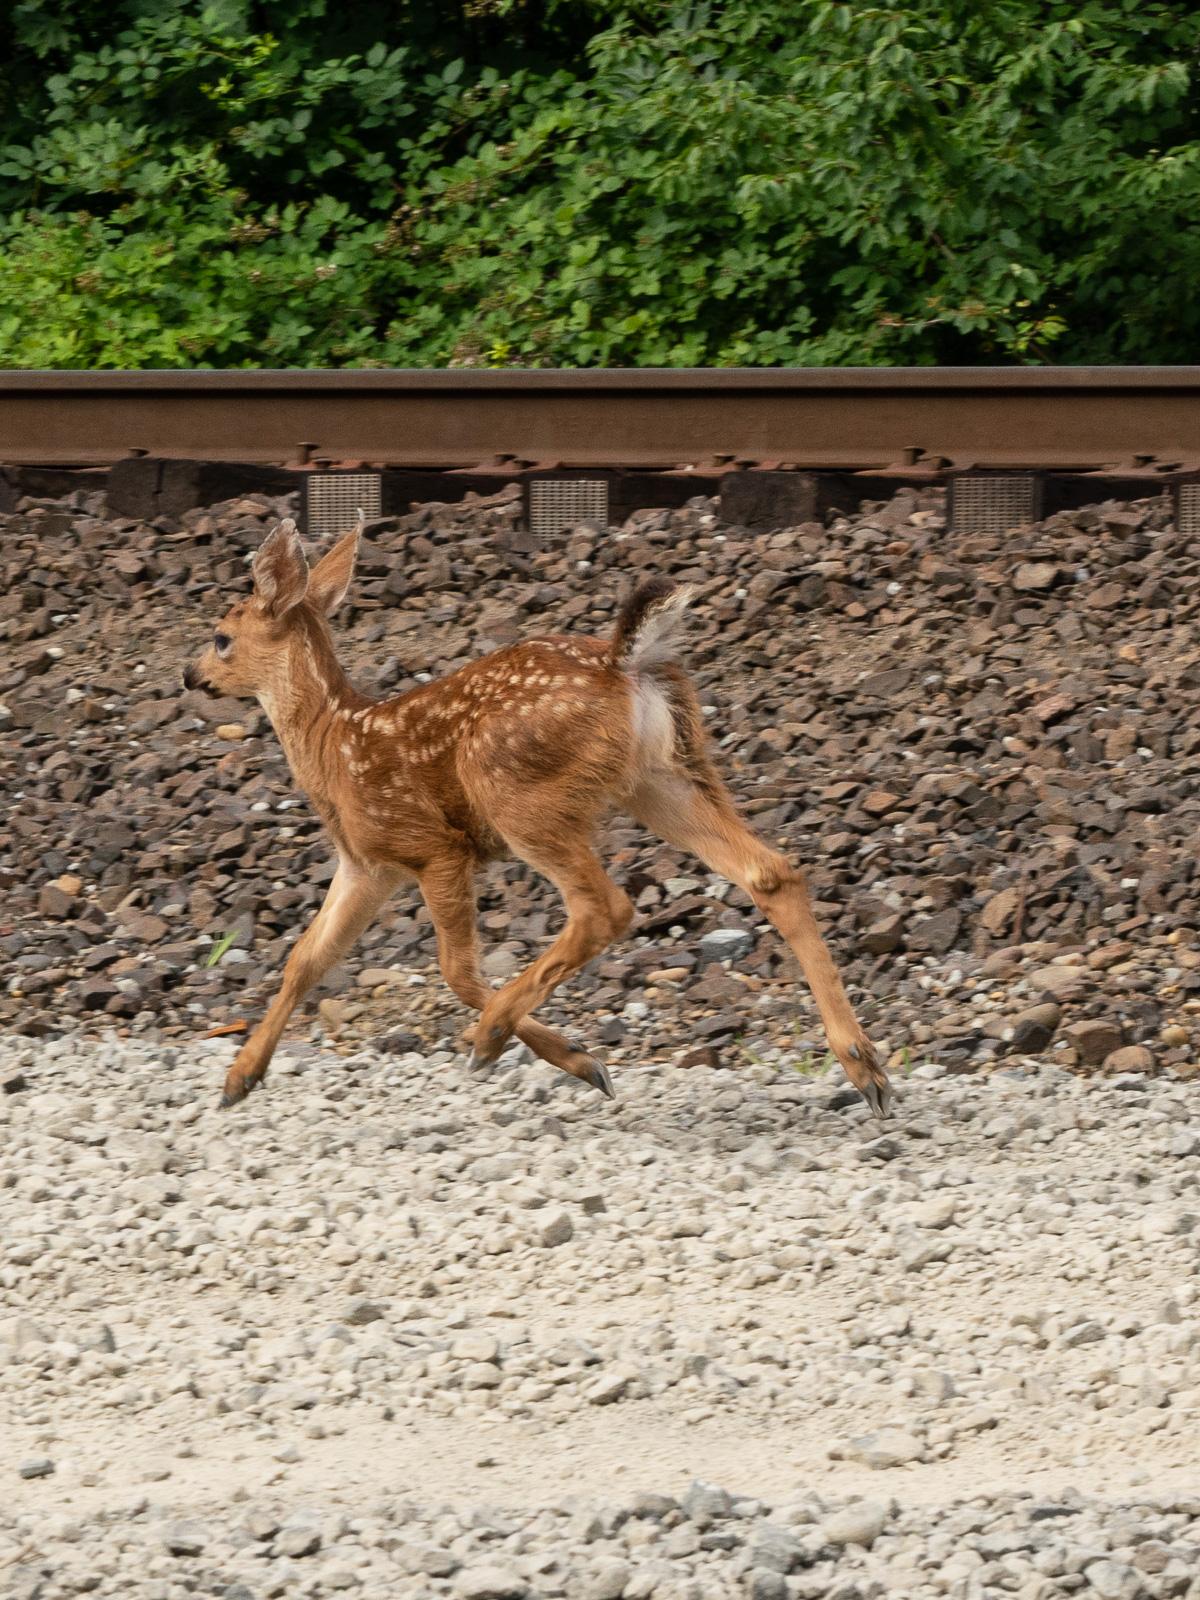 20180707-ridgefield-trains-new-24-105-lens-133_